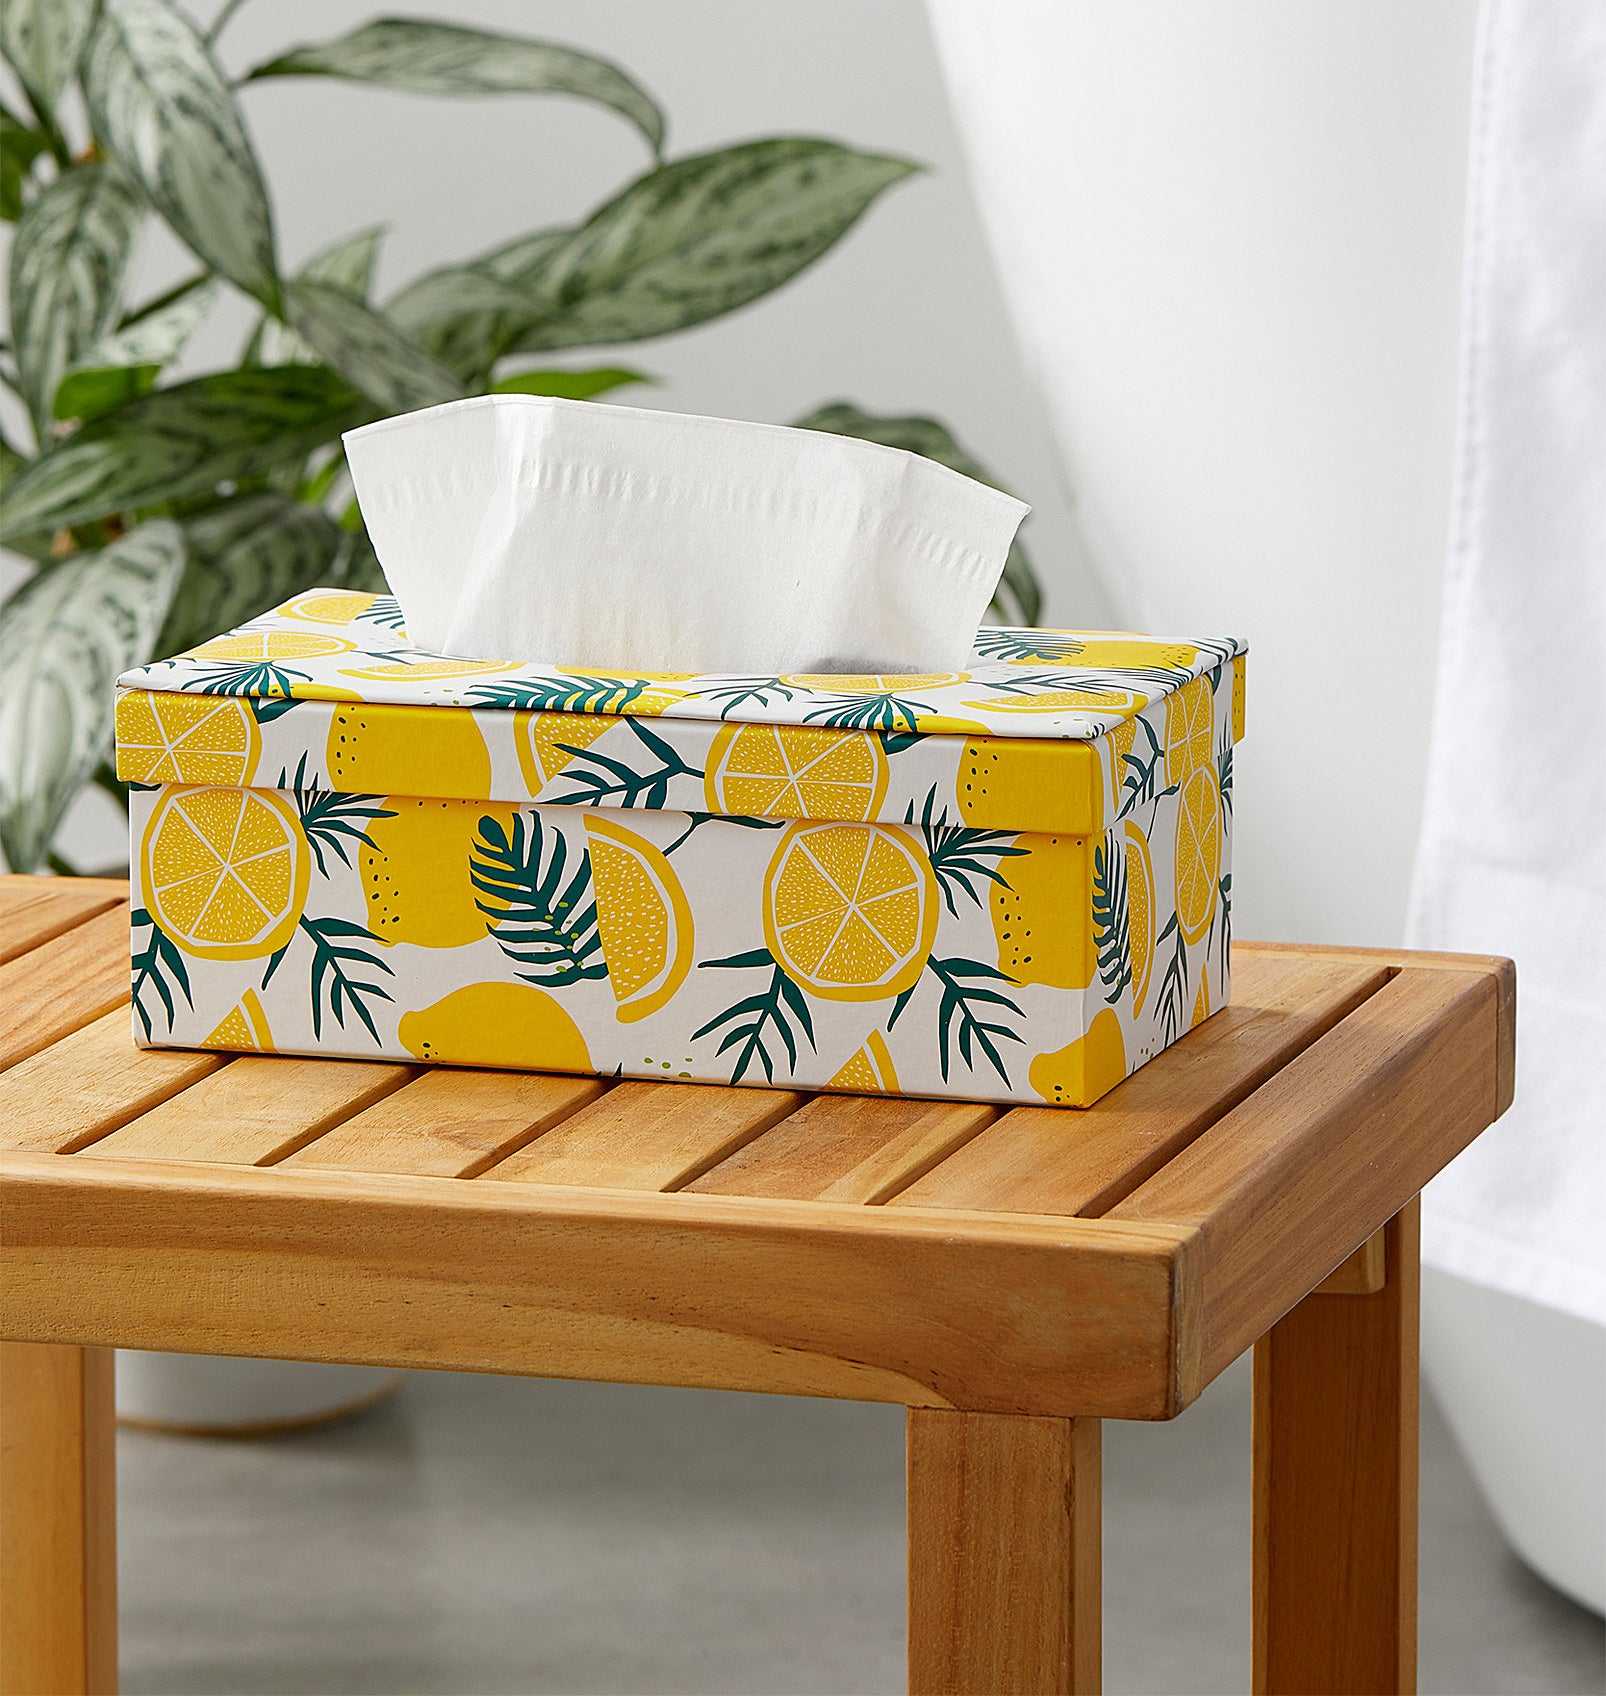 A lemon-print tissue box holder